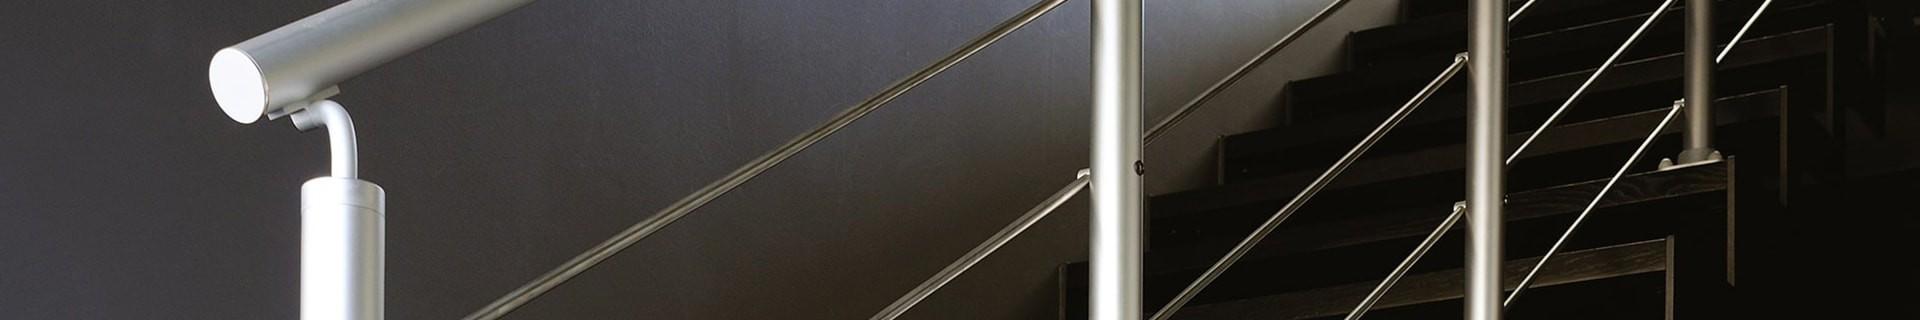 La gamme Smartline en aluminium